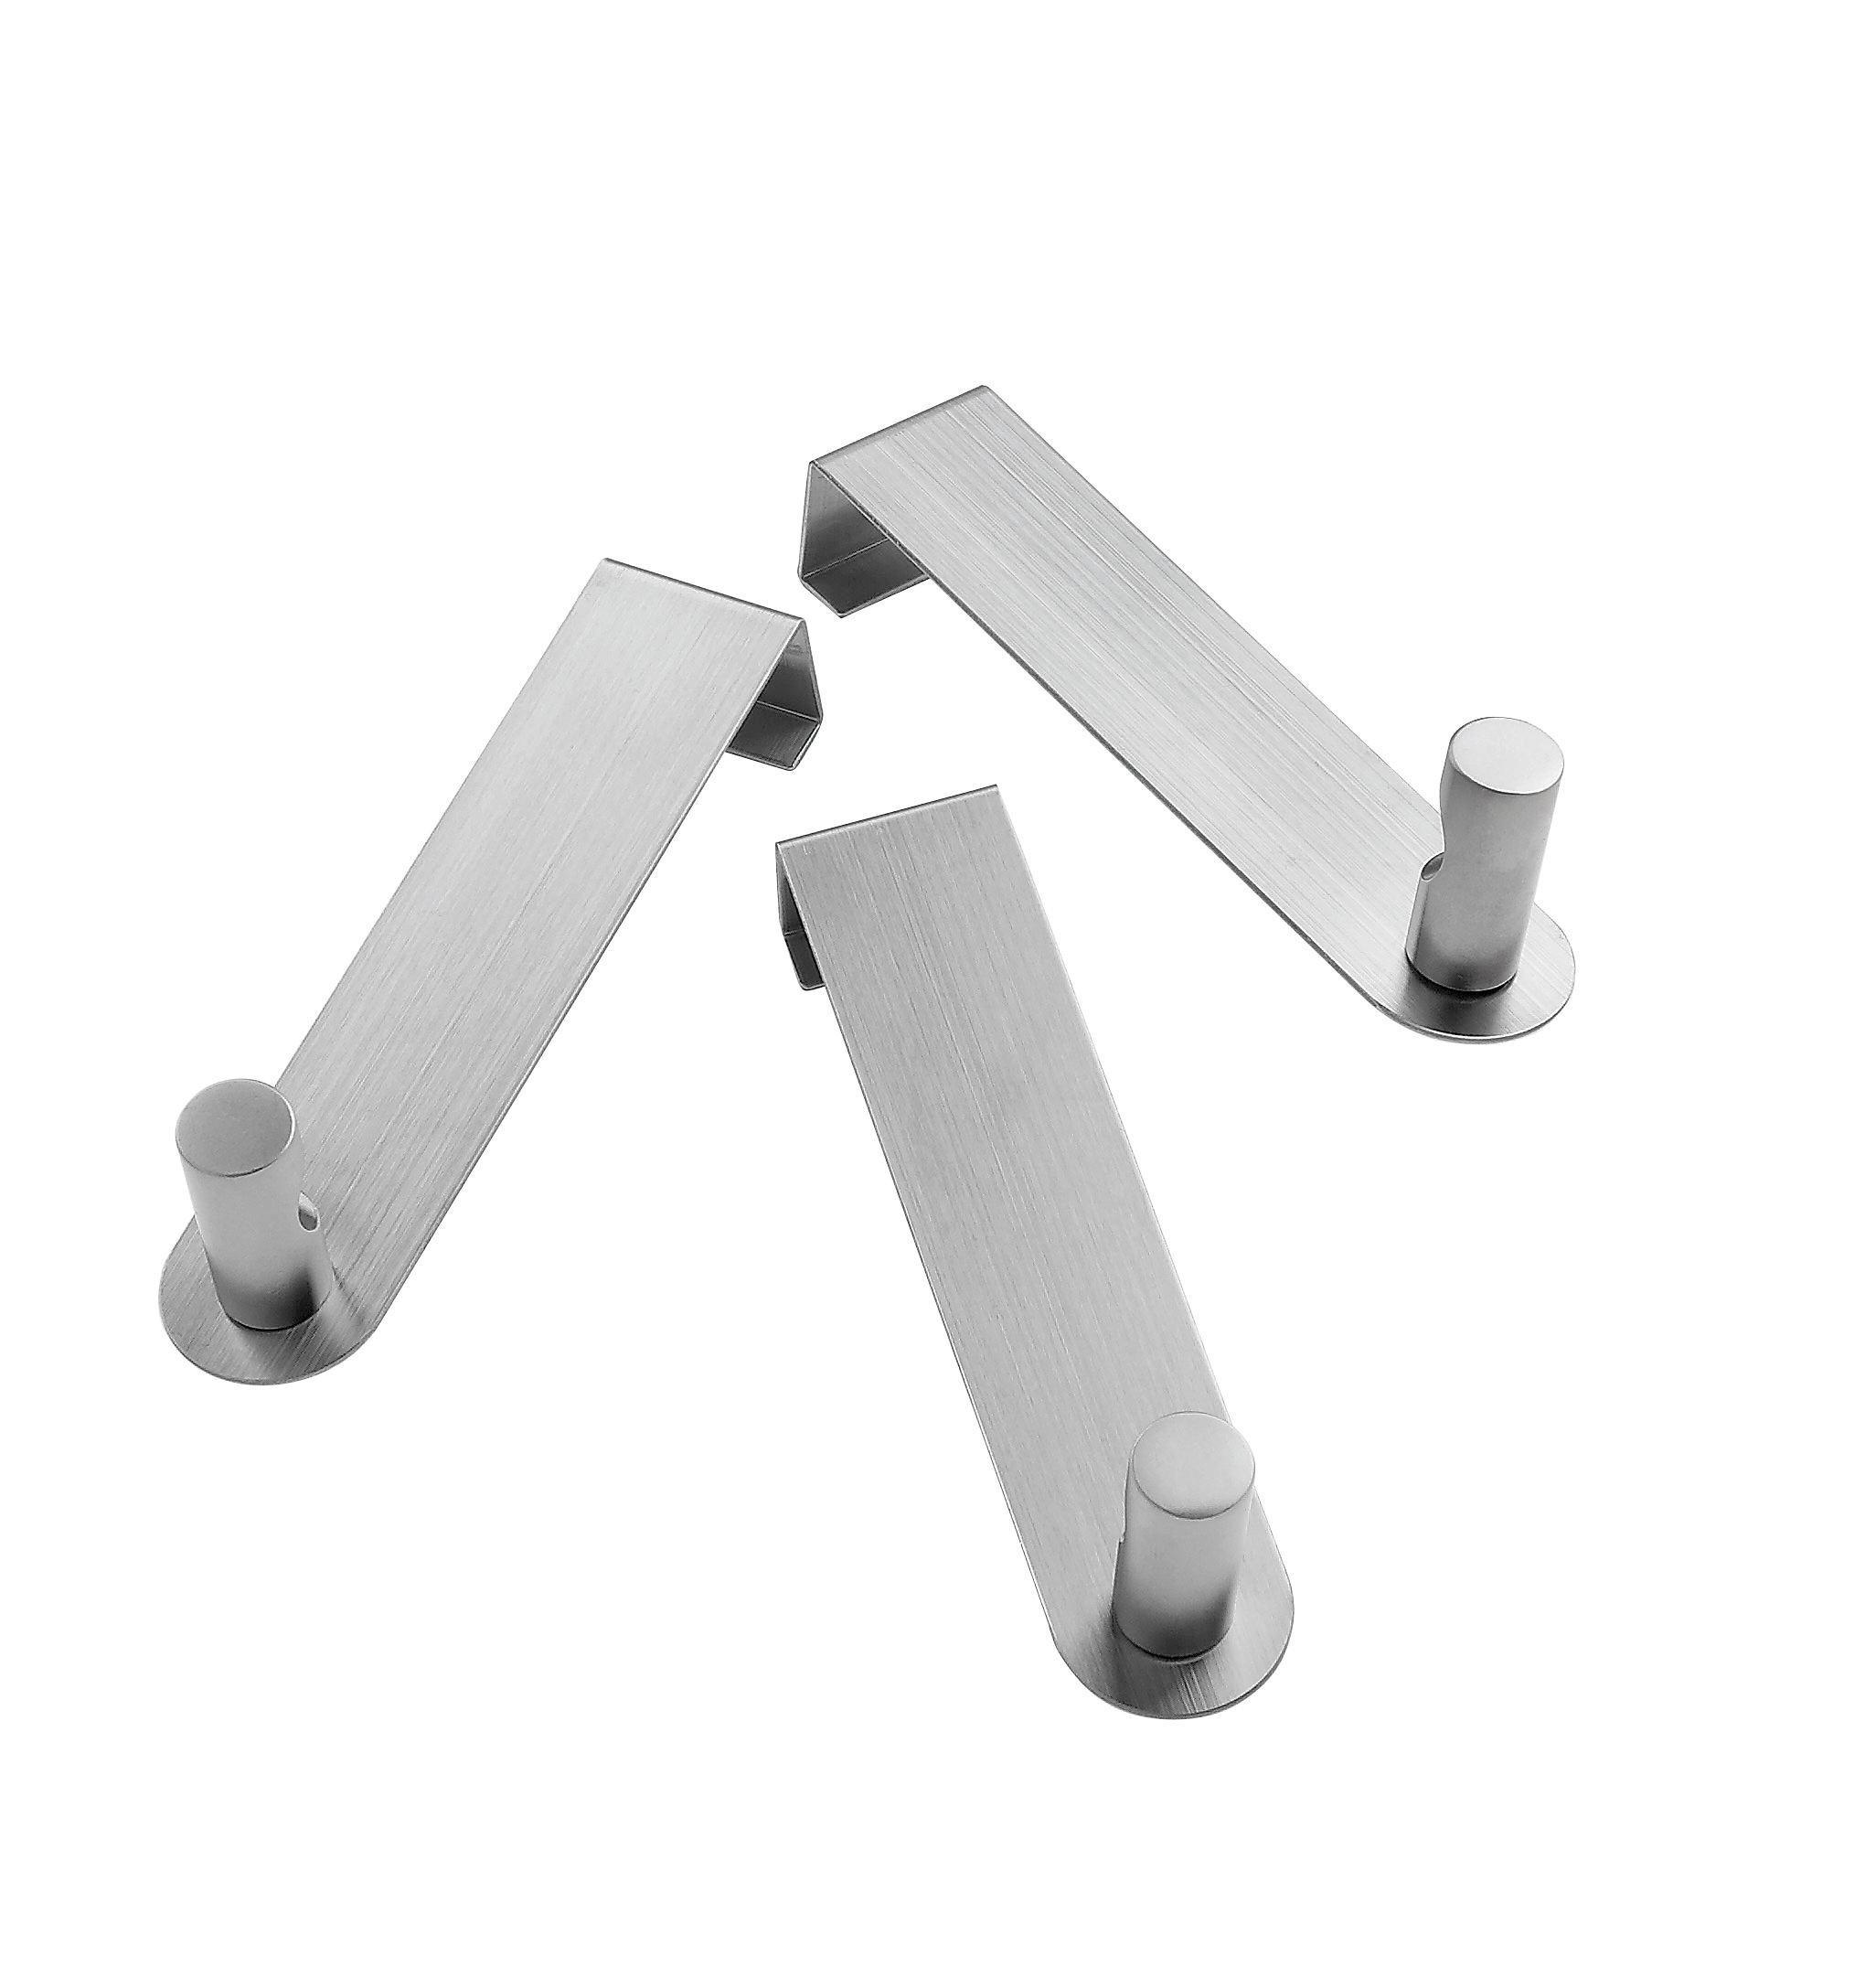 Garderobenhaken in Edelstahlfarben - Edelstahlfarben, Basics, Metall (13,5cm) - MÖMAX modern living